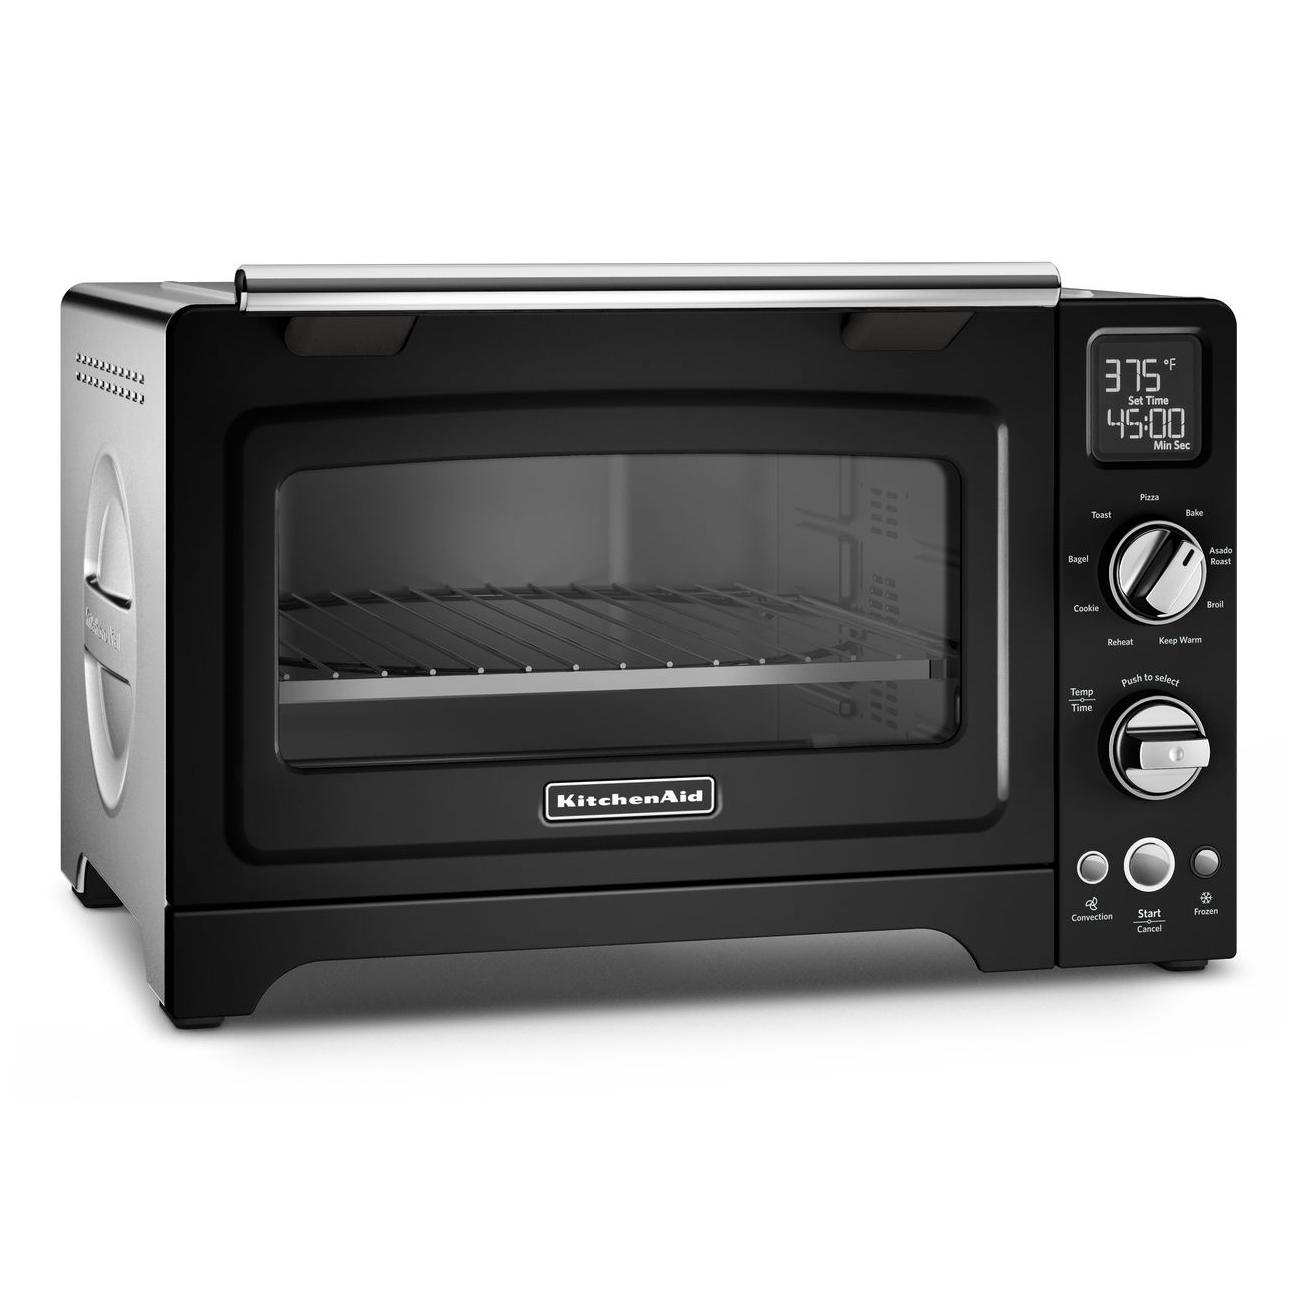 KitchenAid Onyx Black Digital Convection Oven